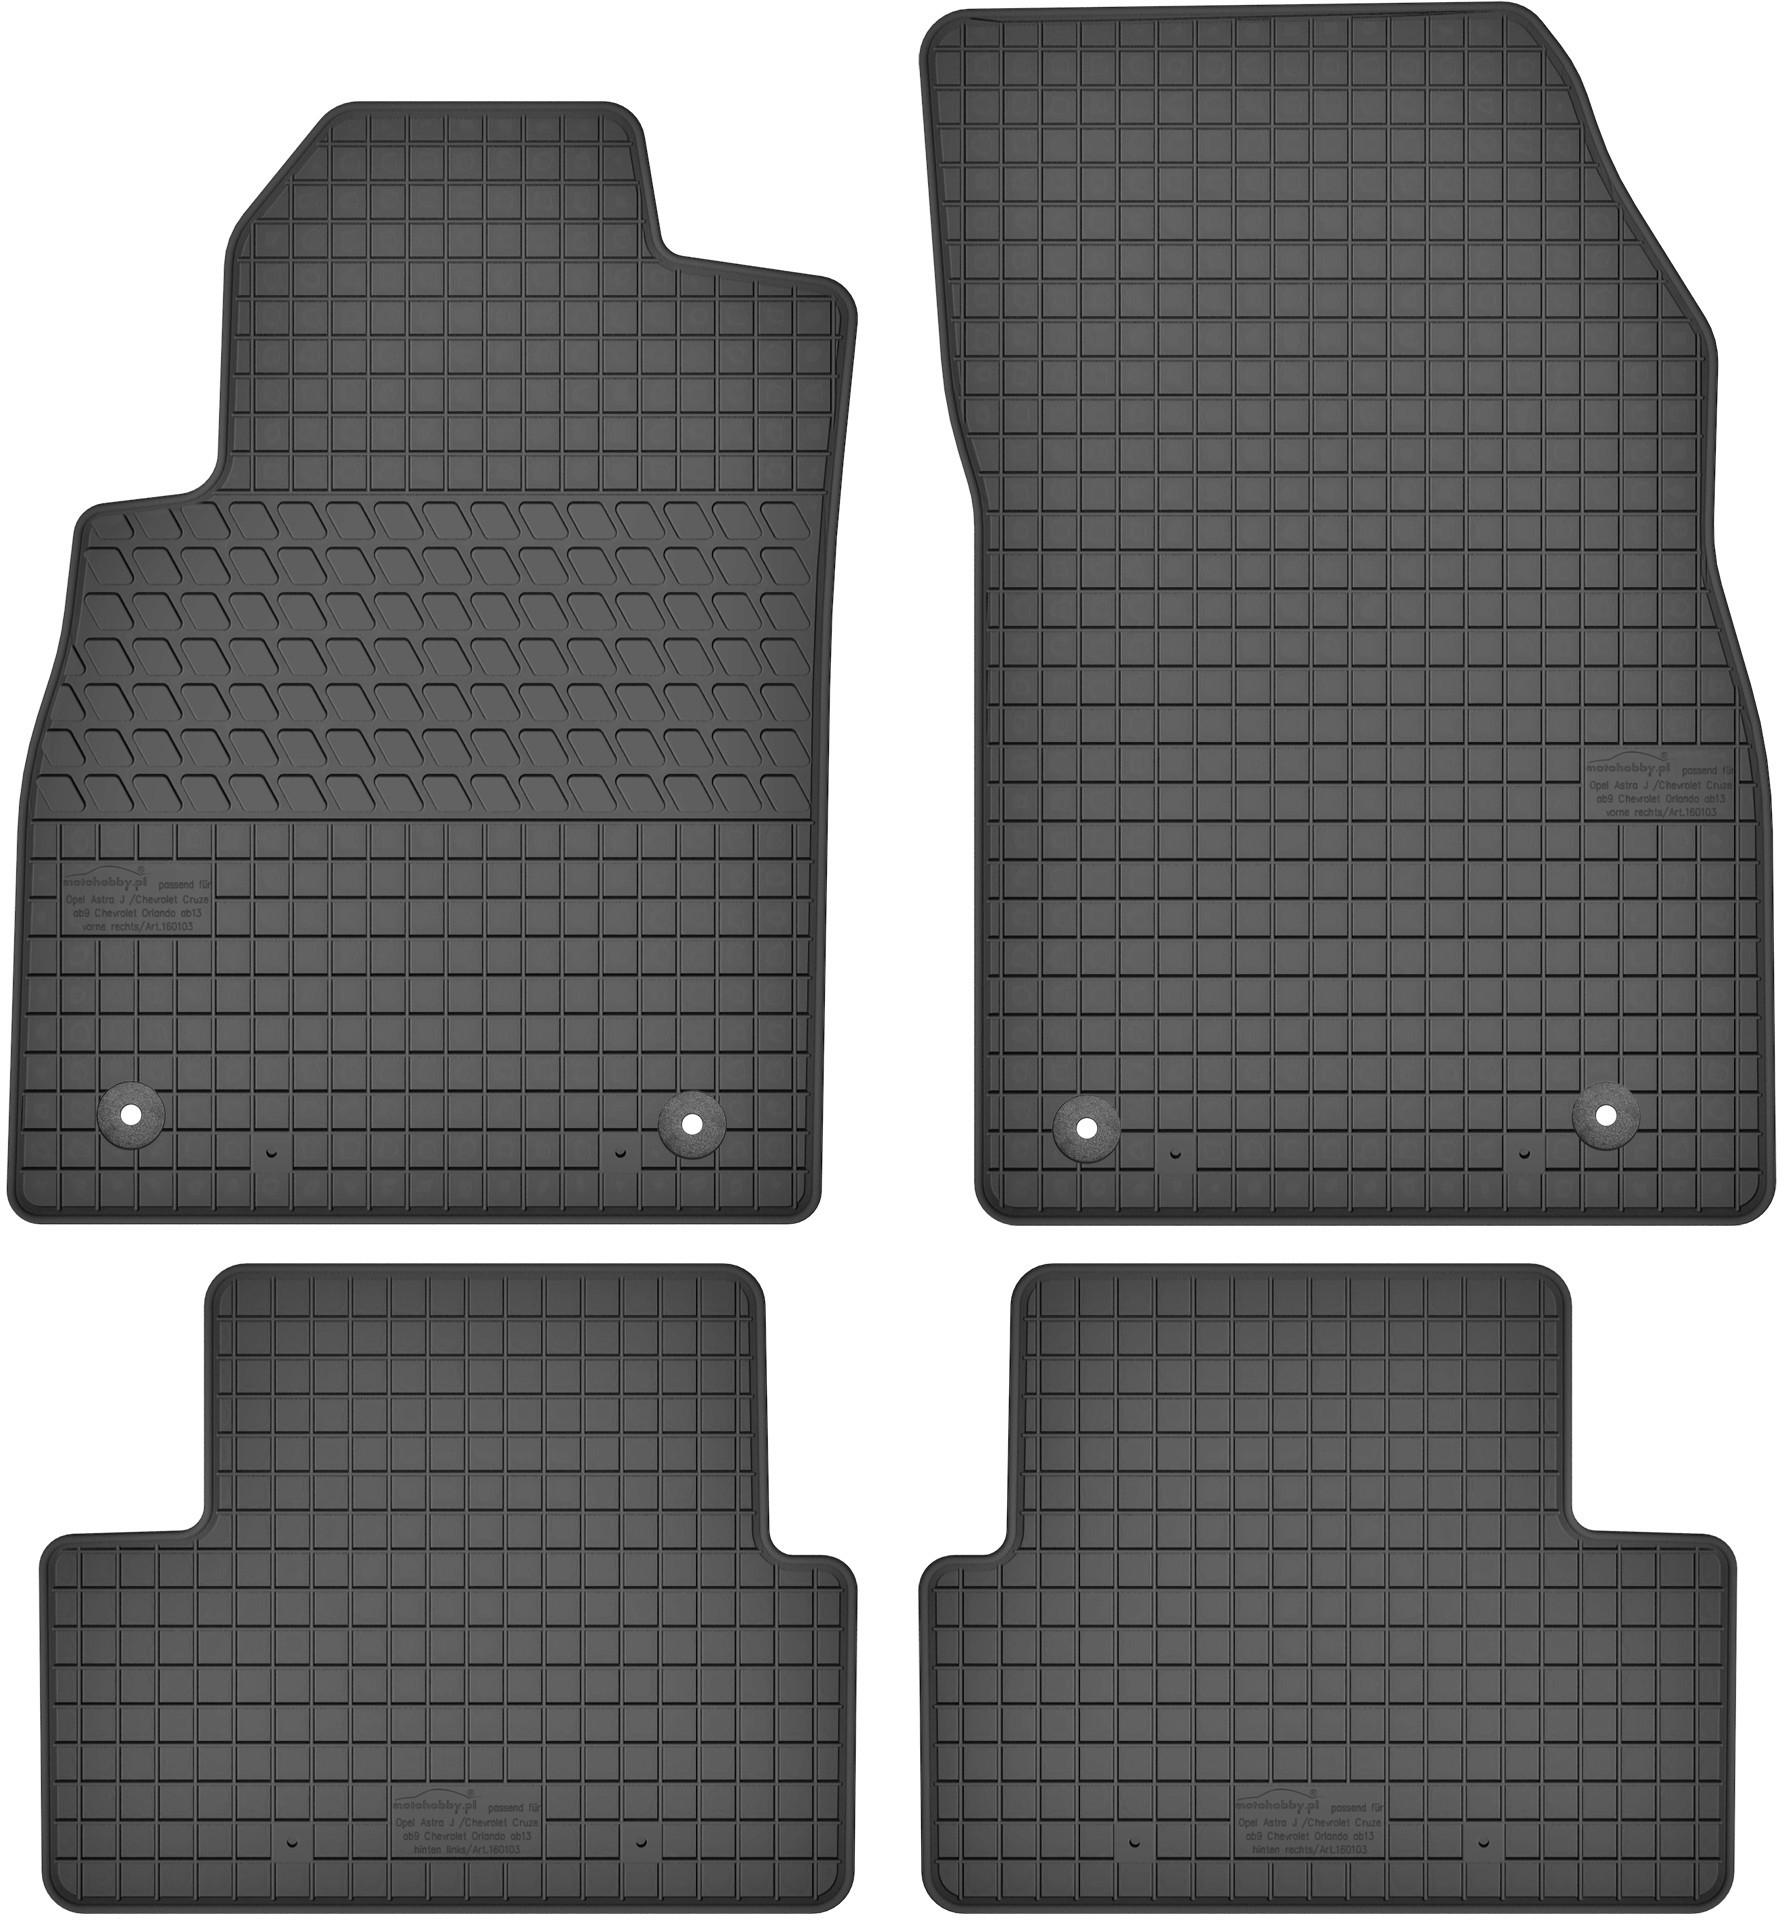 MotoHobby Opel Astra J (2009-2016) - dywaniki gumowe dedykowane ze stoperami